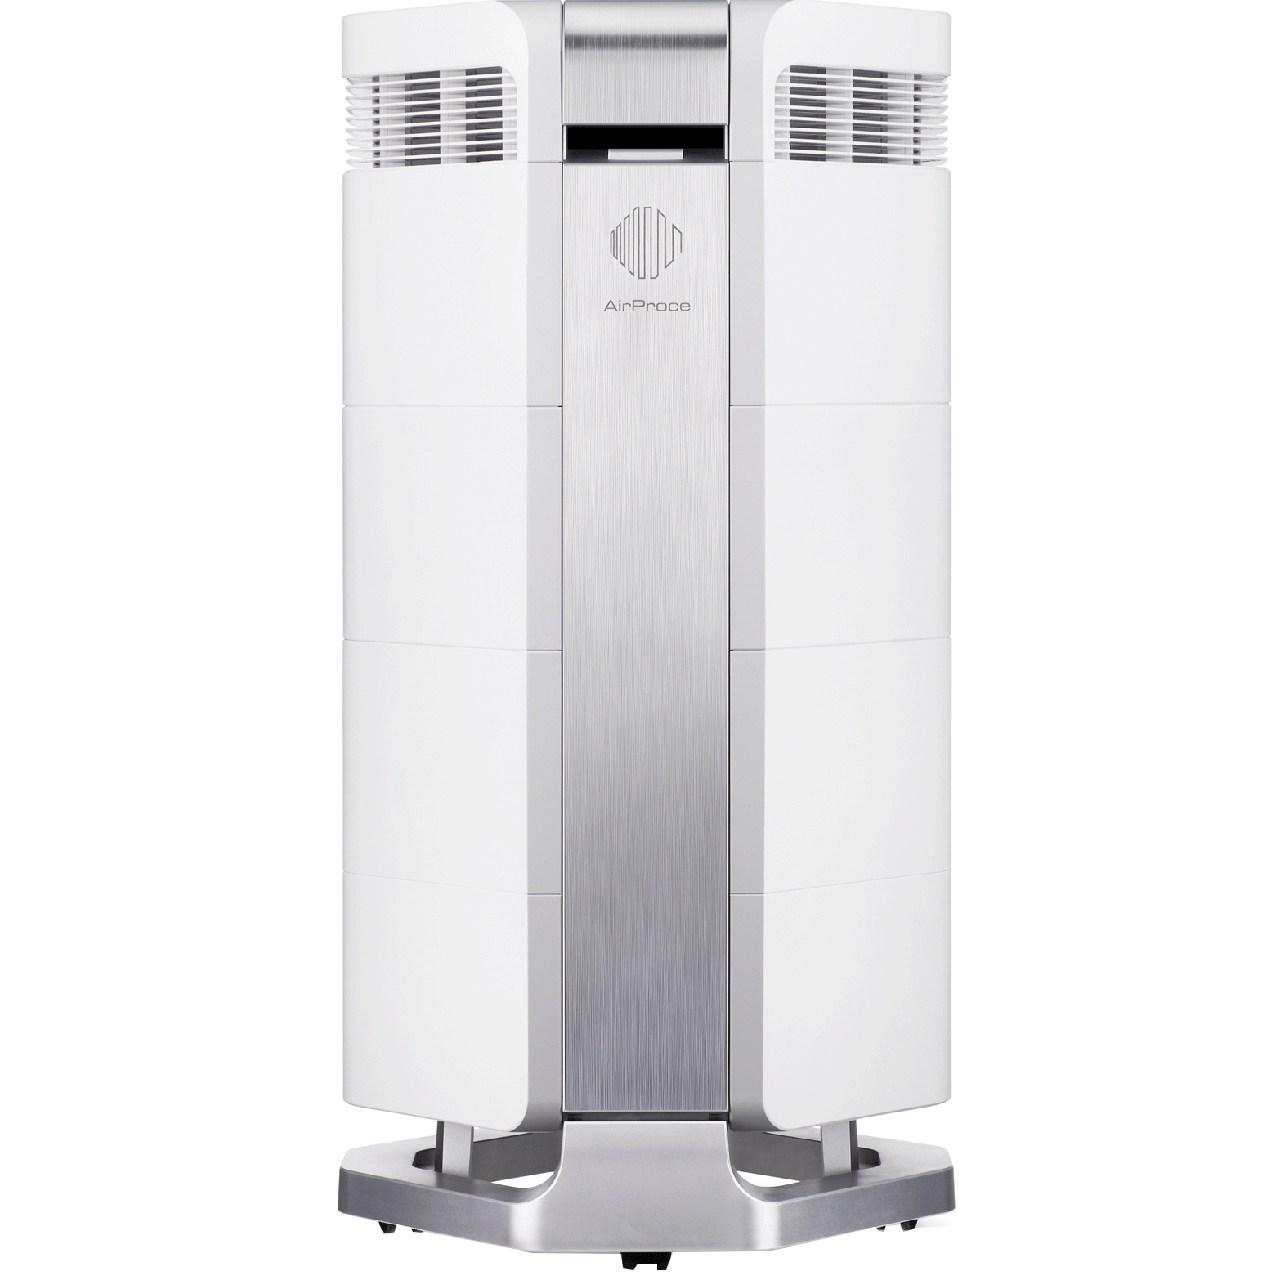 تصفیه کننده هوای ایرپروس مدل AI-600 | AirProce AI-600 Air Purifier